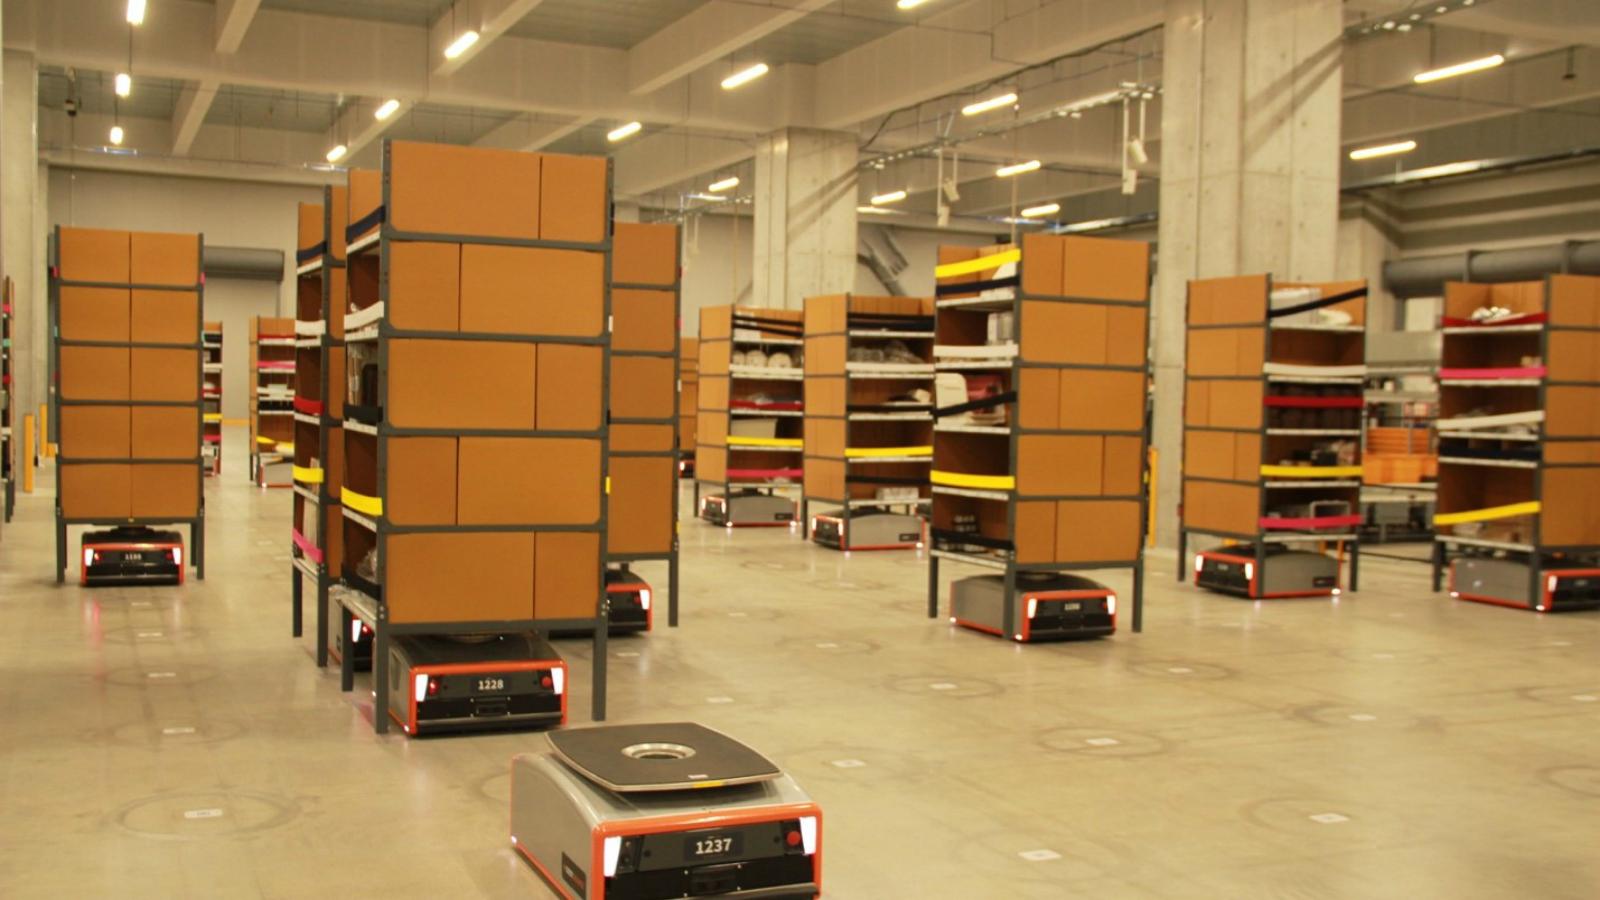 Robotics startup GreyOrange launches in US to battle Amazon